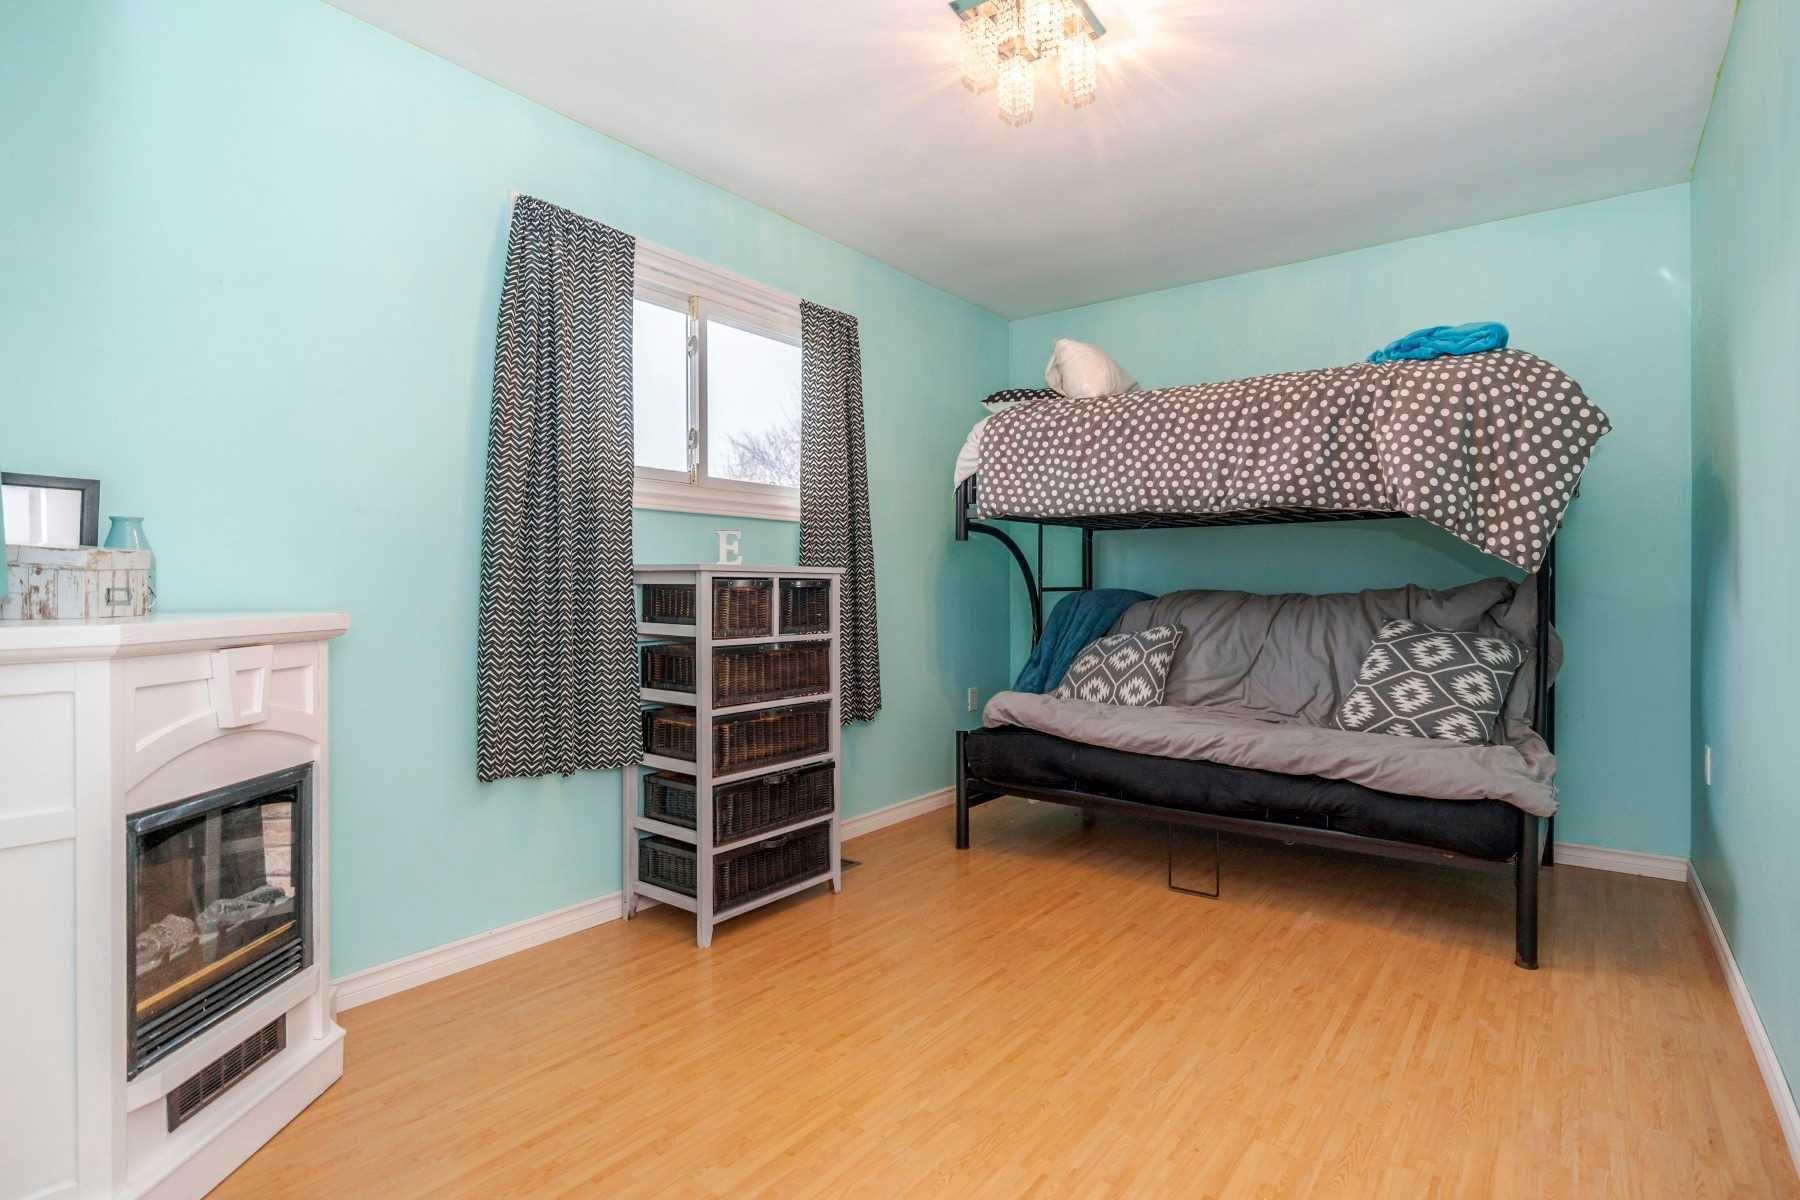 Photo 12: Photos: 190 N Church Street in Clarington: Orono House (Sidesplit 4) for sale : MLS®# E4463047